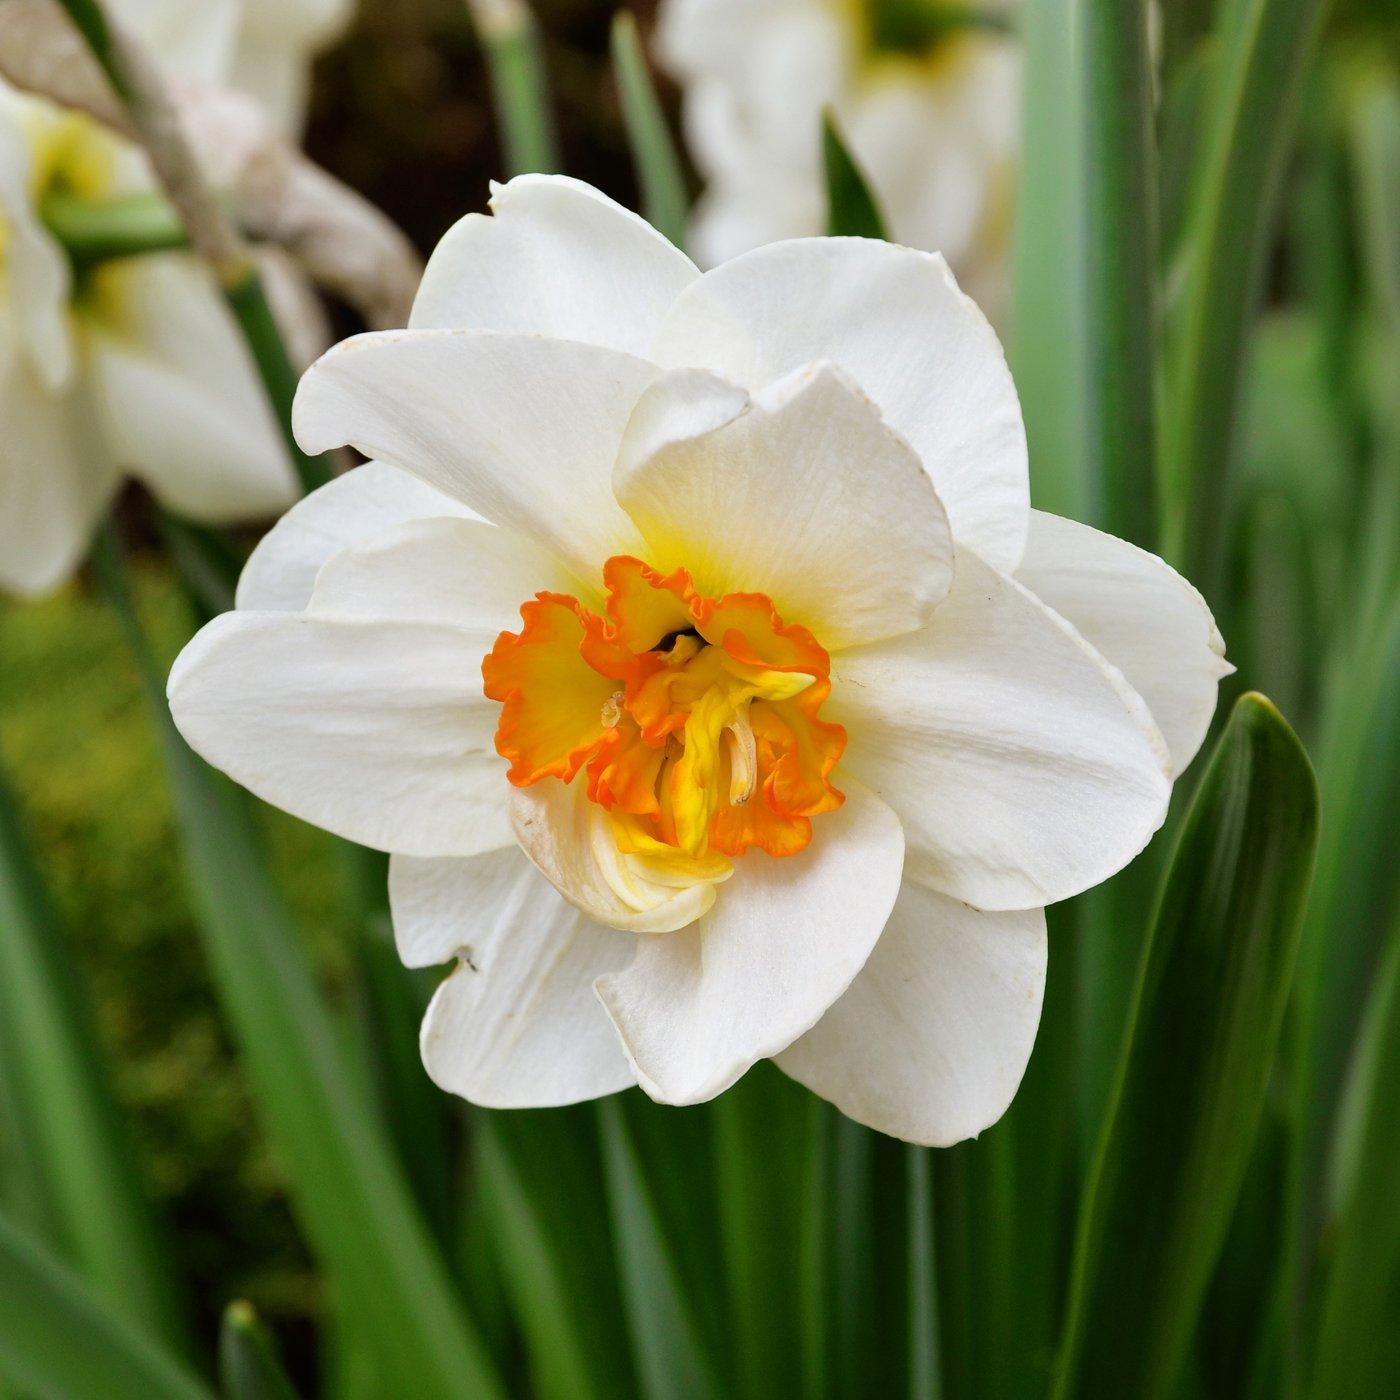 Daffodil Bulbs for Sale Online – Easy To Grow Bulbs